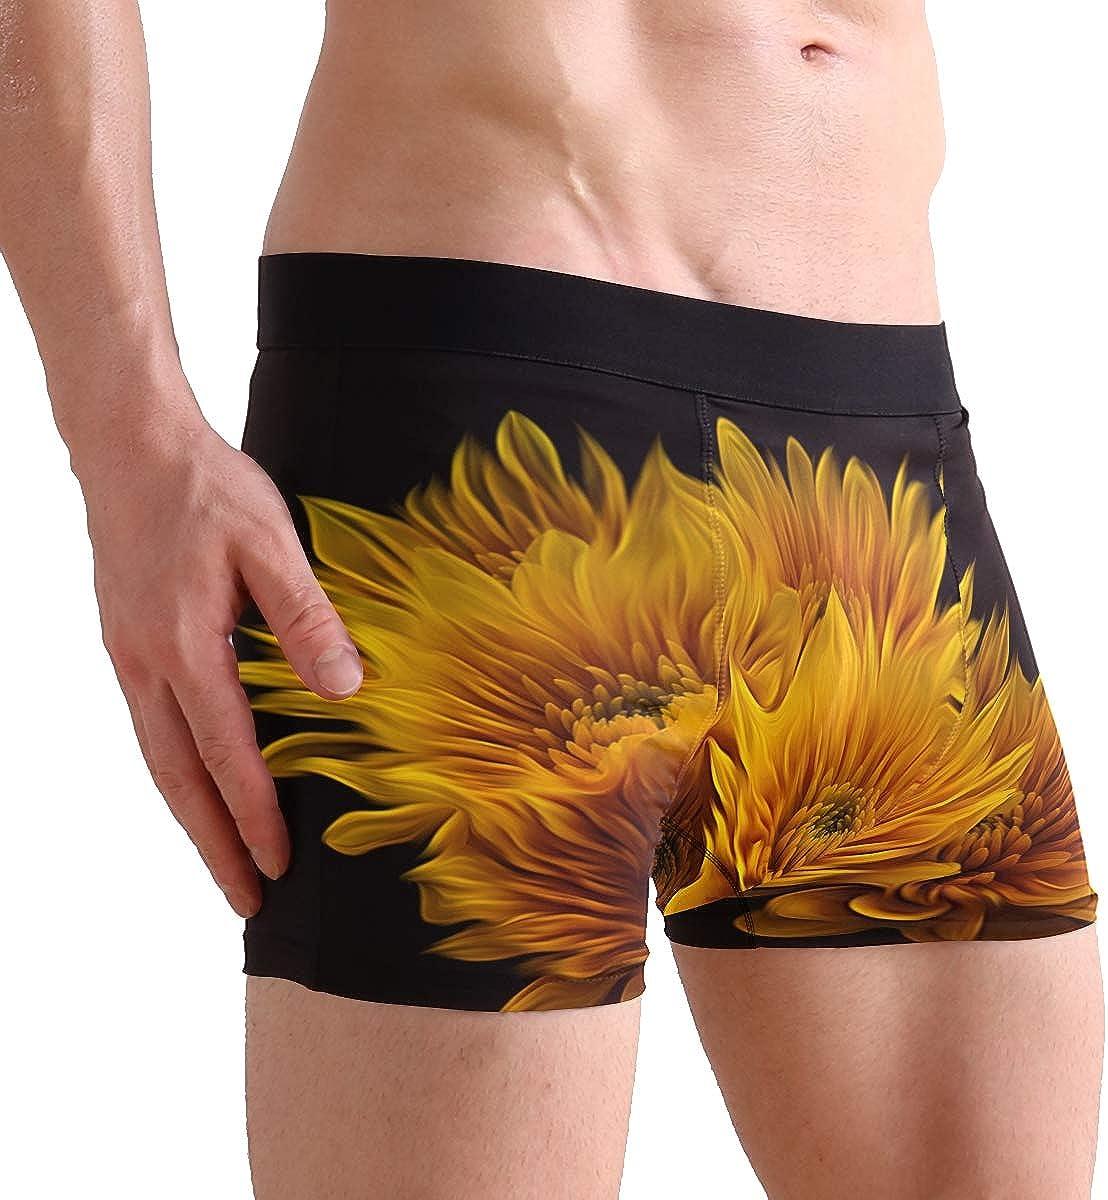 SUABO Mens 2-Pack Boxer Briefs Polyester Underwear Trunk Underwear with 1 Design